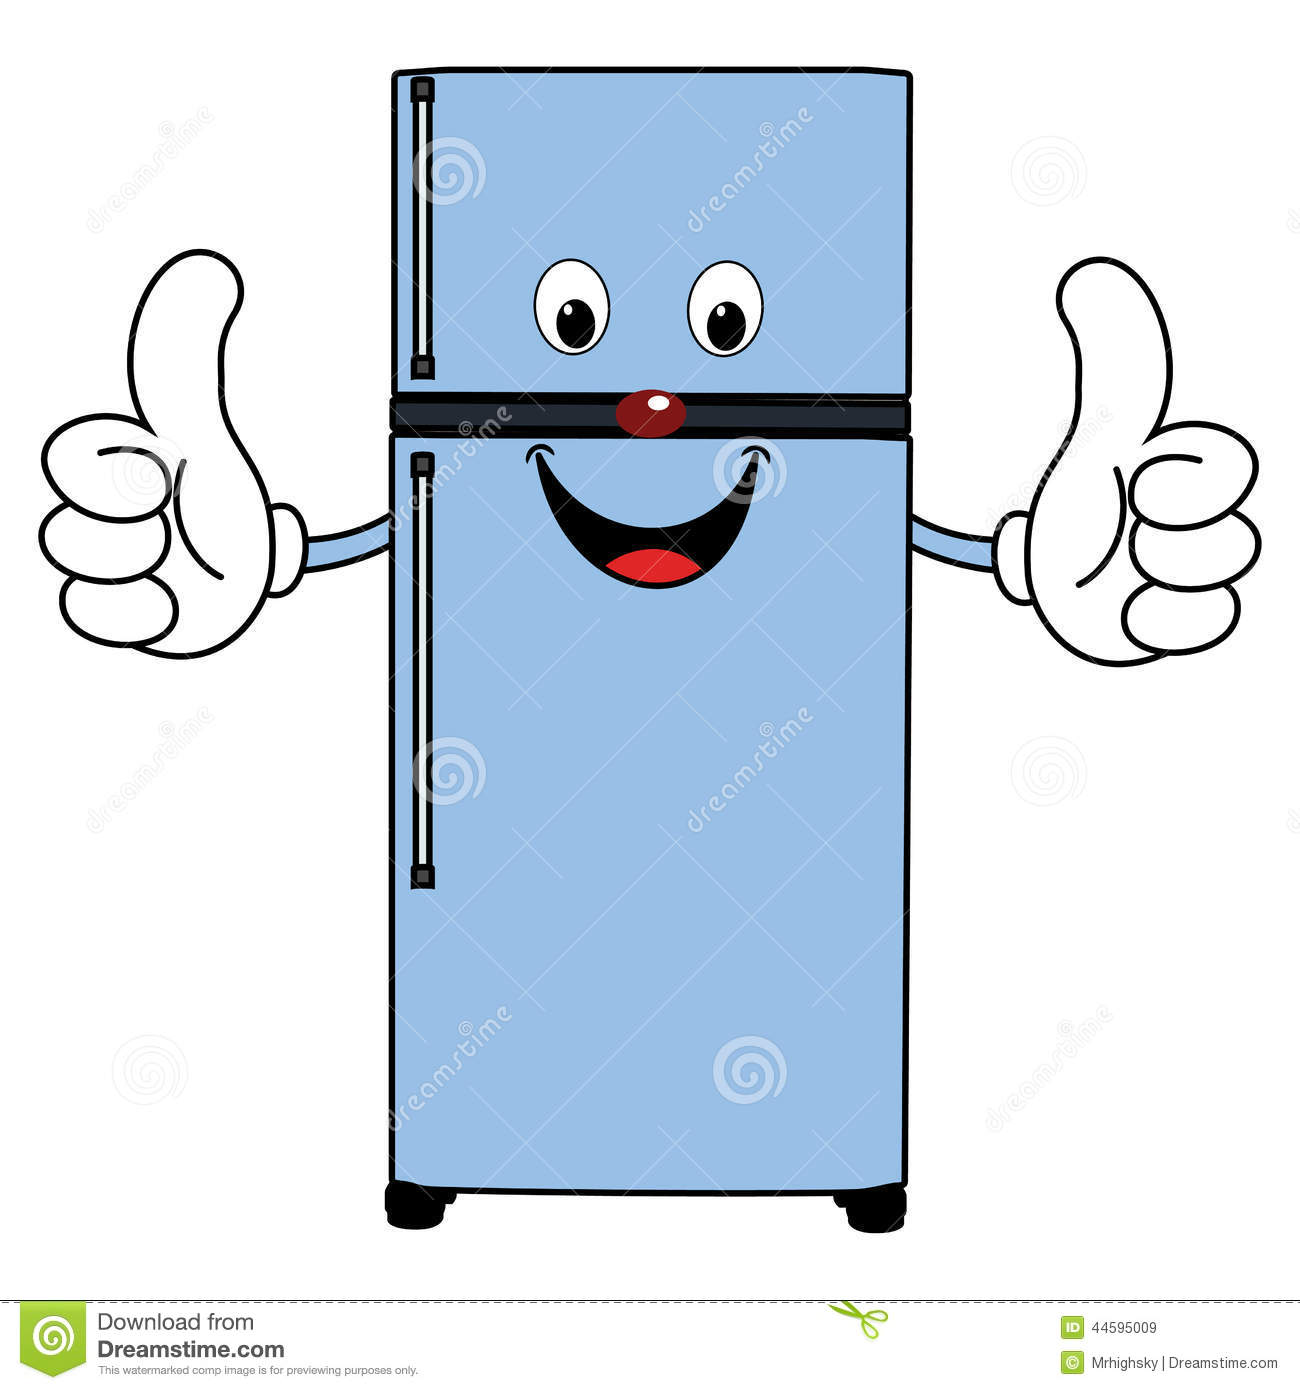 Fridge clipart cartoon. Refrigerator free download best